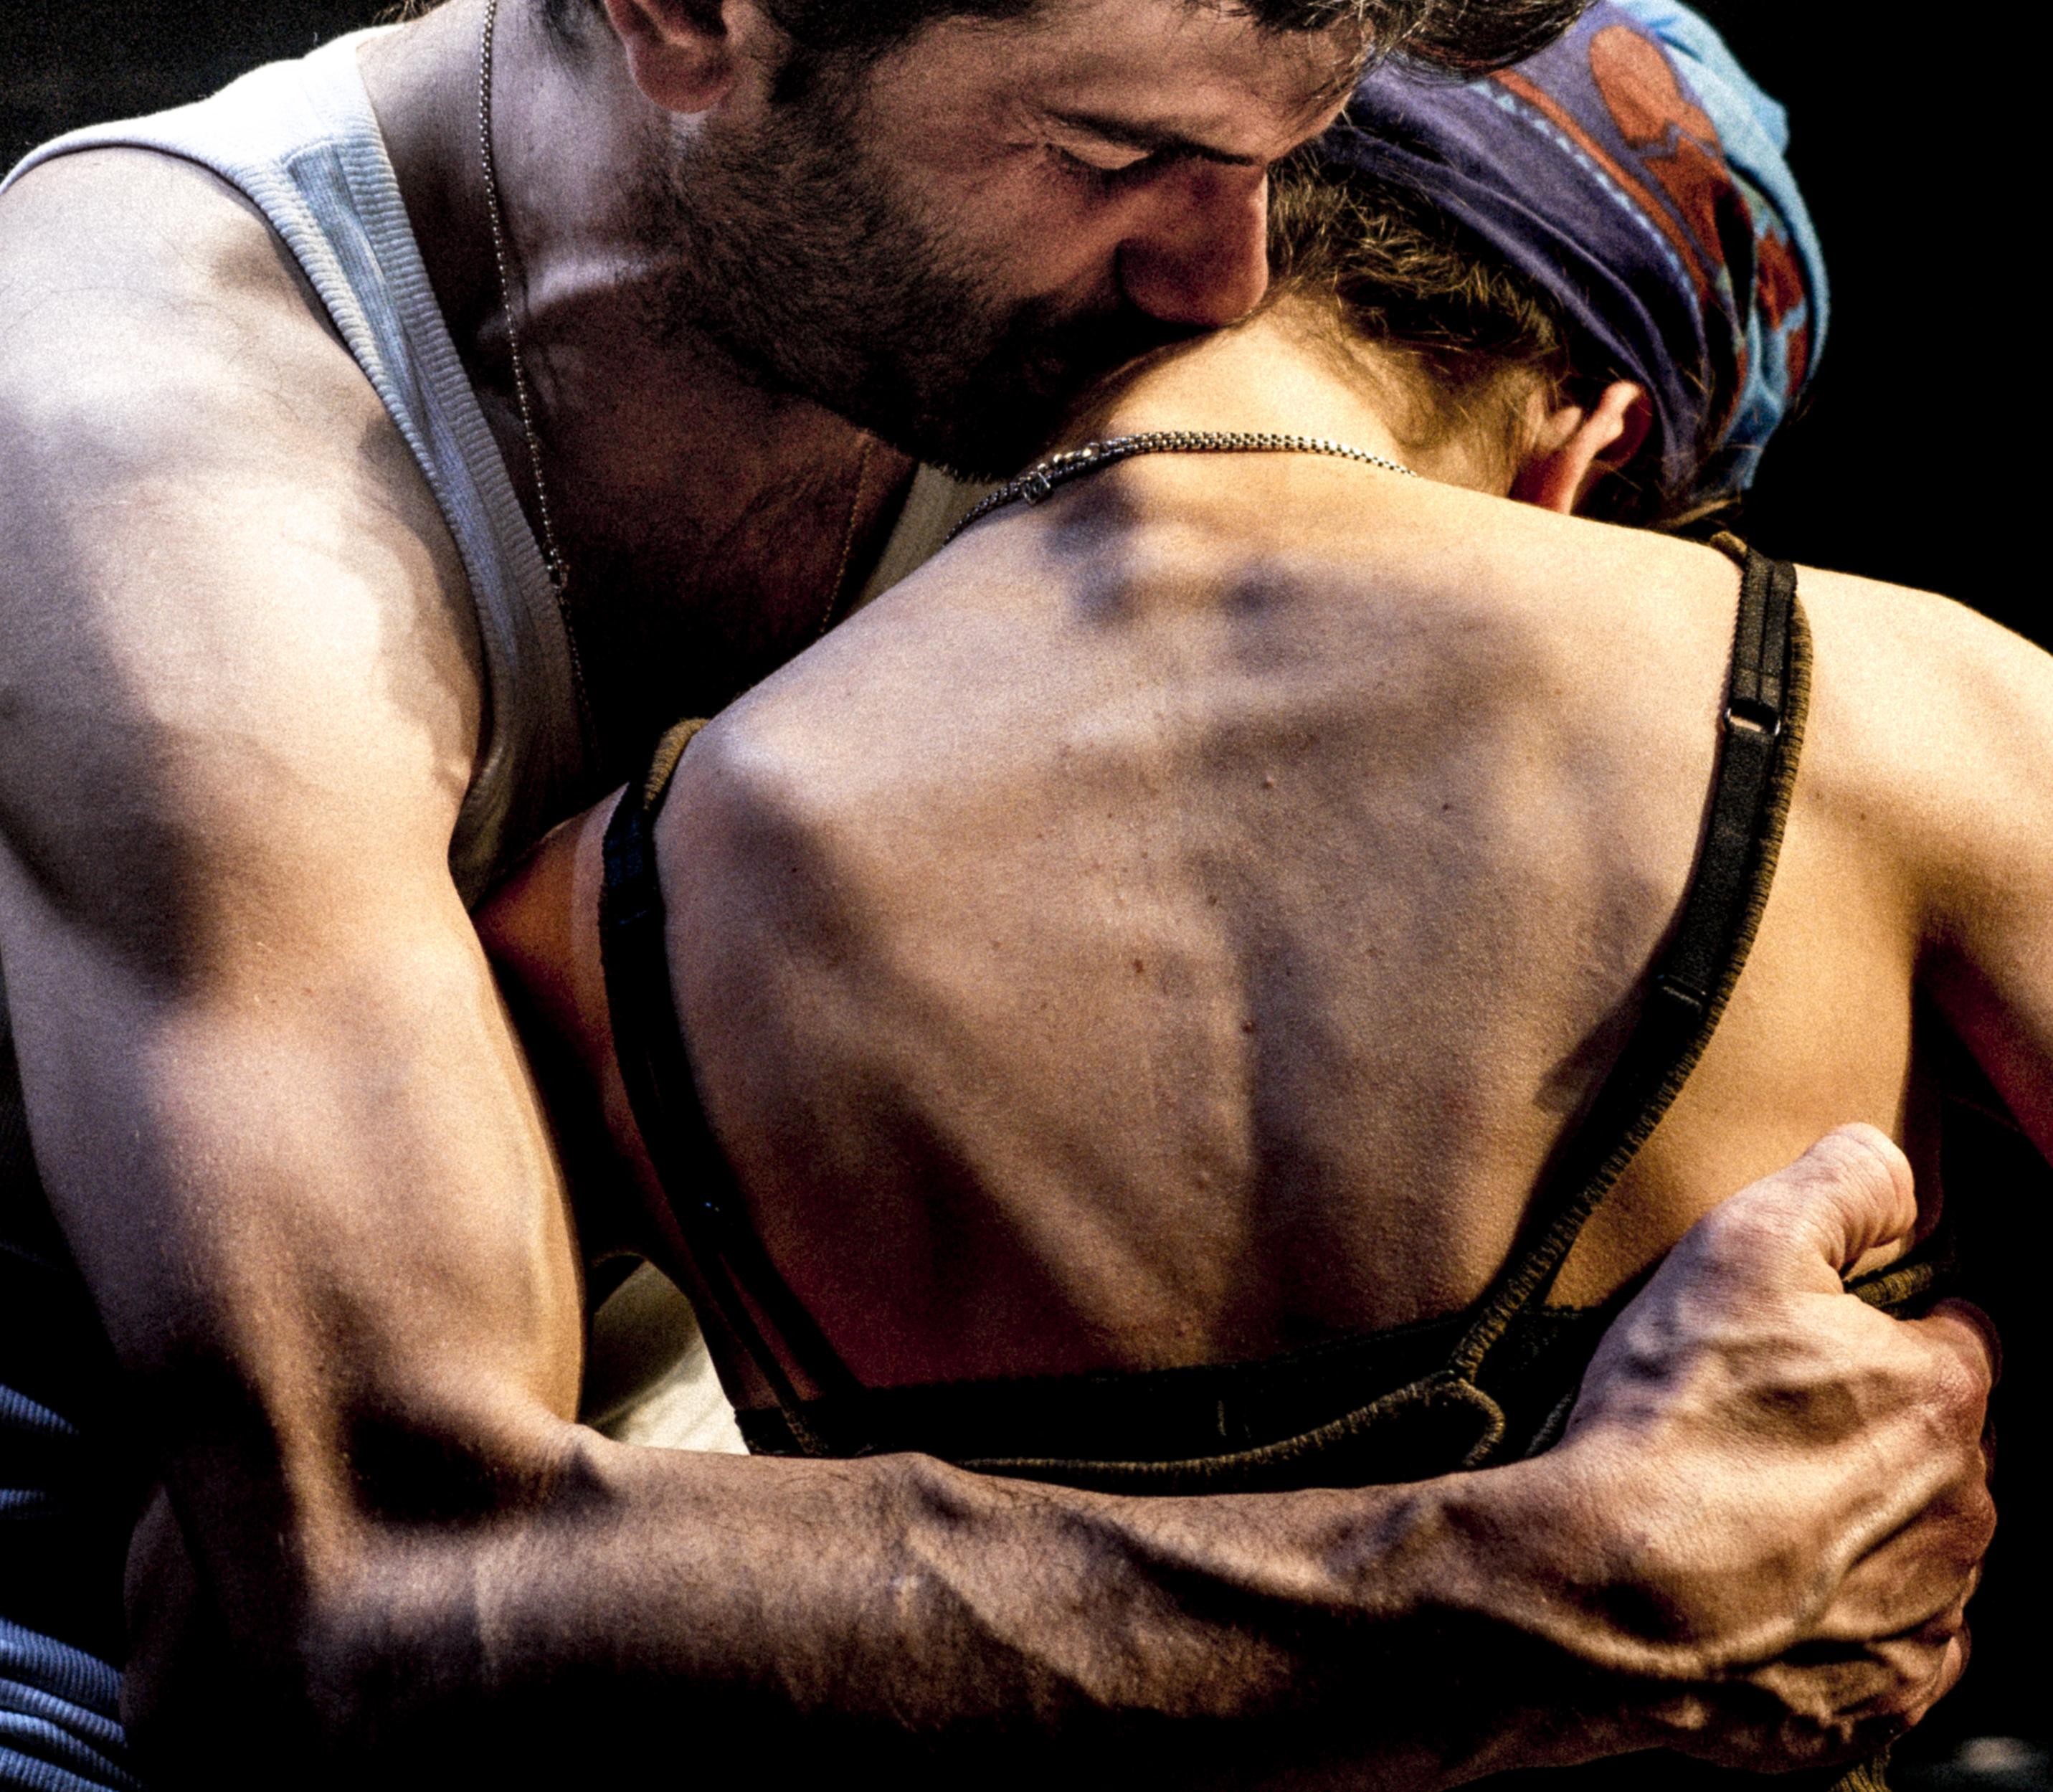 https://www.ntng.gr/gallery/ntng/MediaKit/180523_KALOKAIRI2018/PHOTO_AFTER_THE_CAMPSITE1.JPG